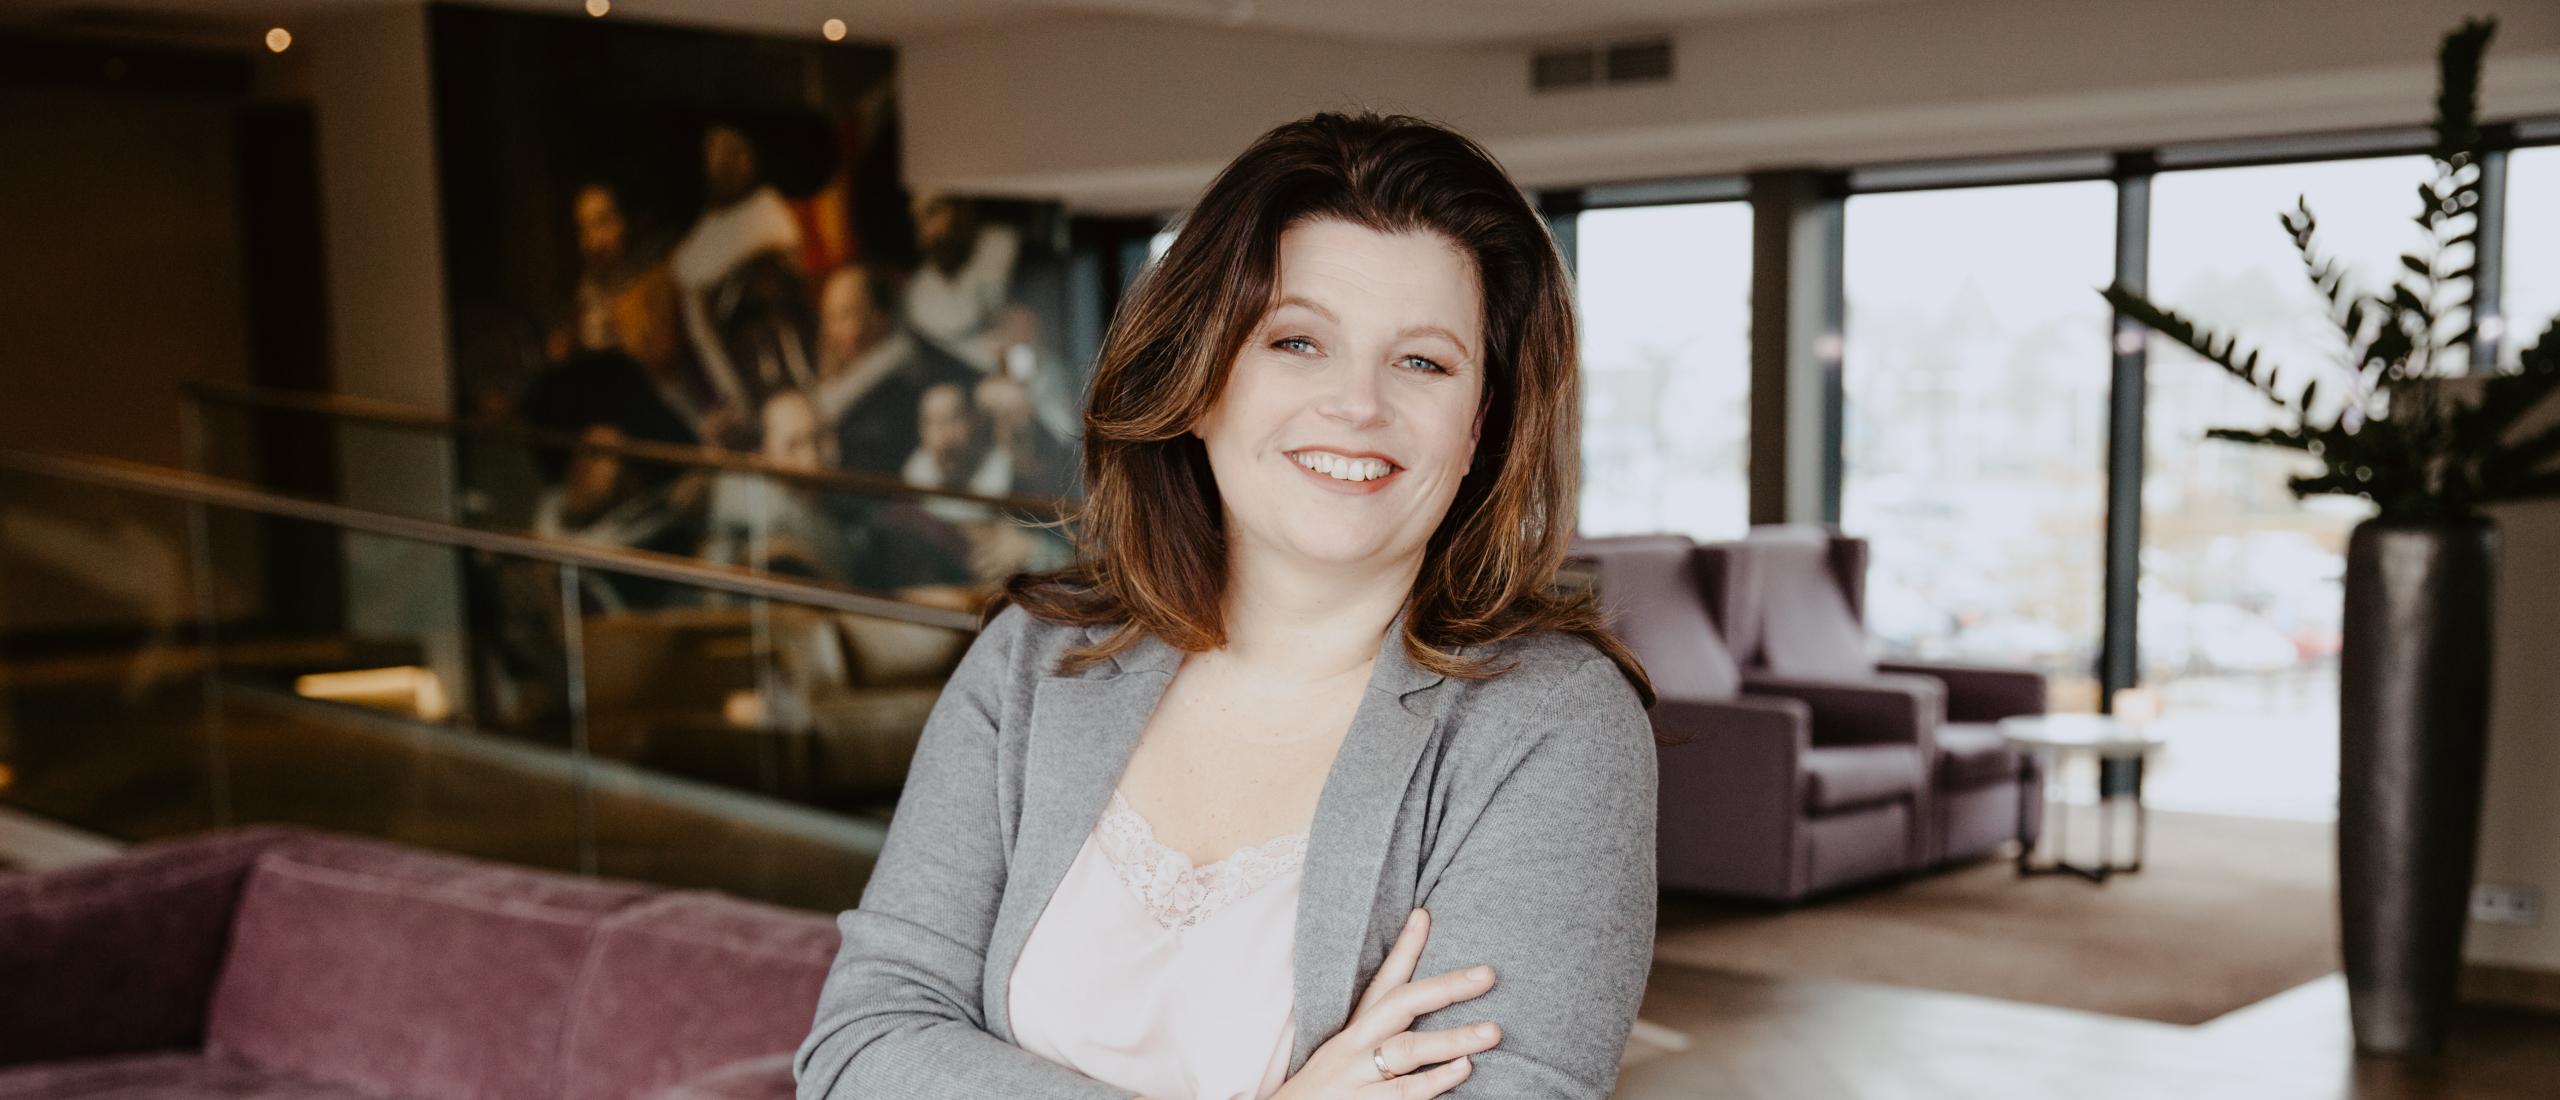 Integrator in de spotlights: Chantal Nolte